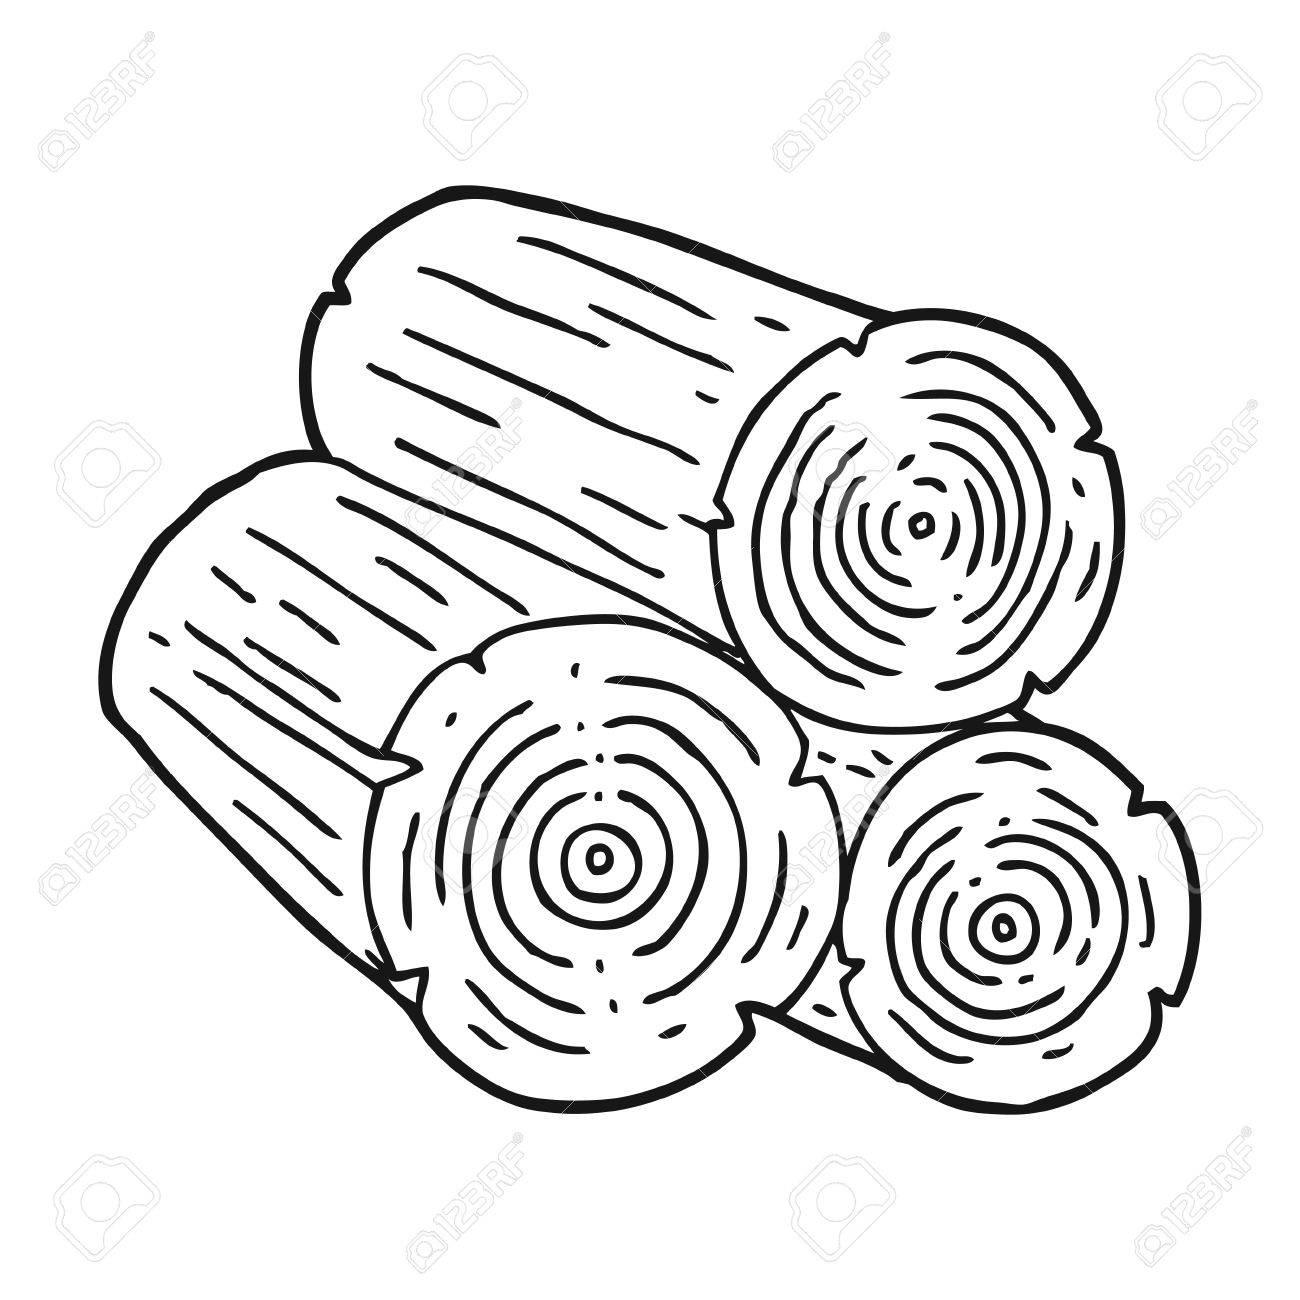 freehand drawn black and white cartoon logs - 53108251